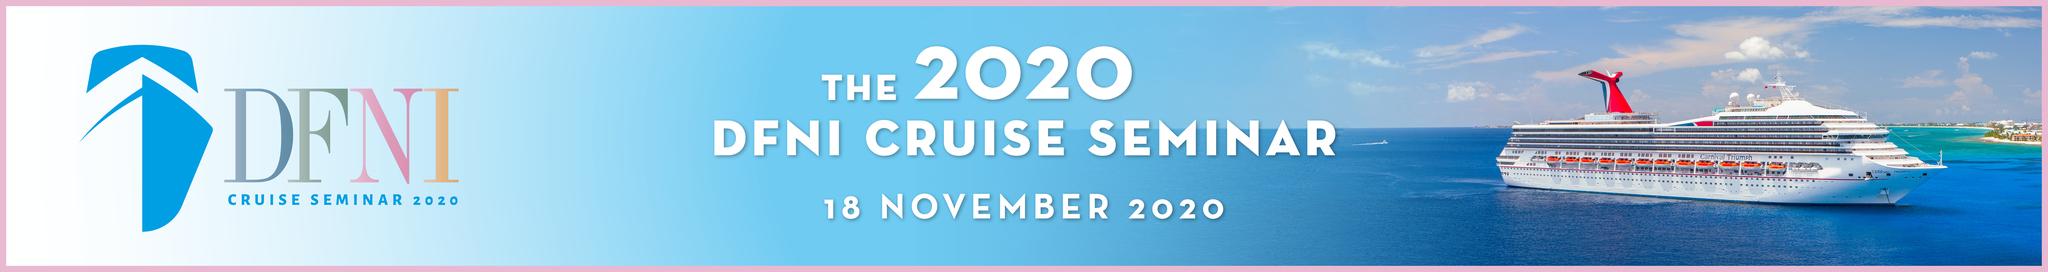 DFNI Cruise Seminar